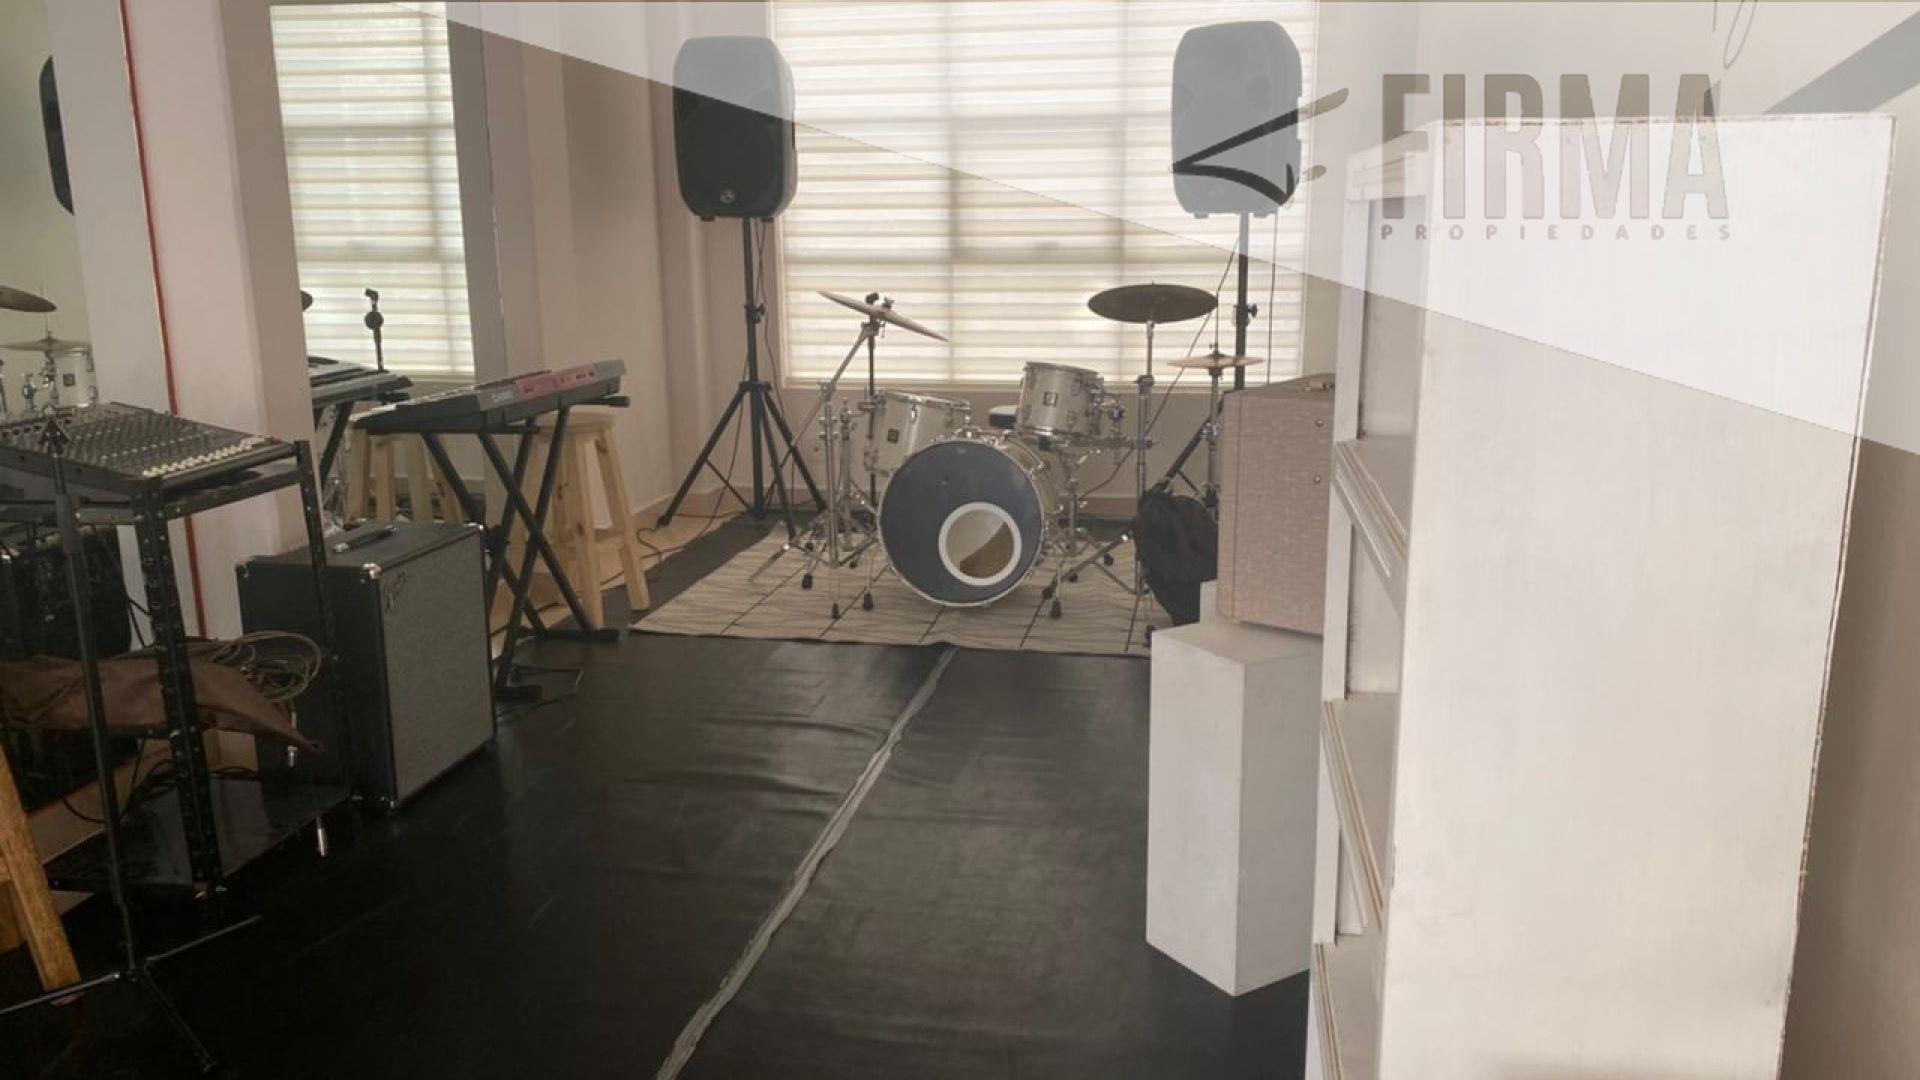 Oficina en Alquiler ALQUILA ESTA OFICINA EN CALACOTO Foto 5